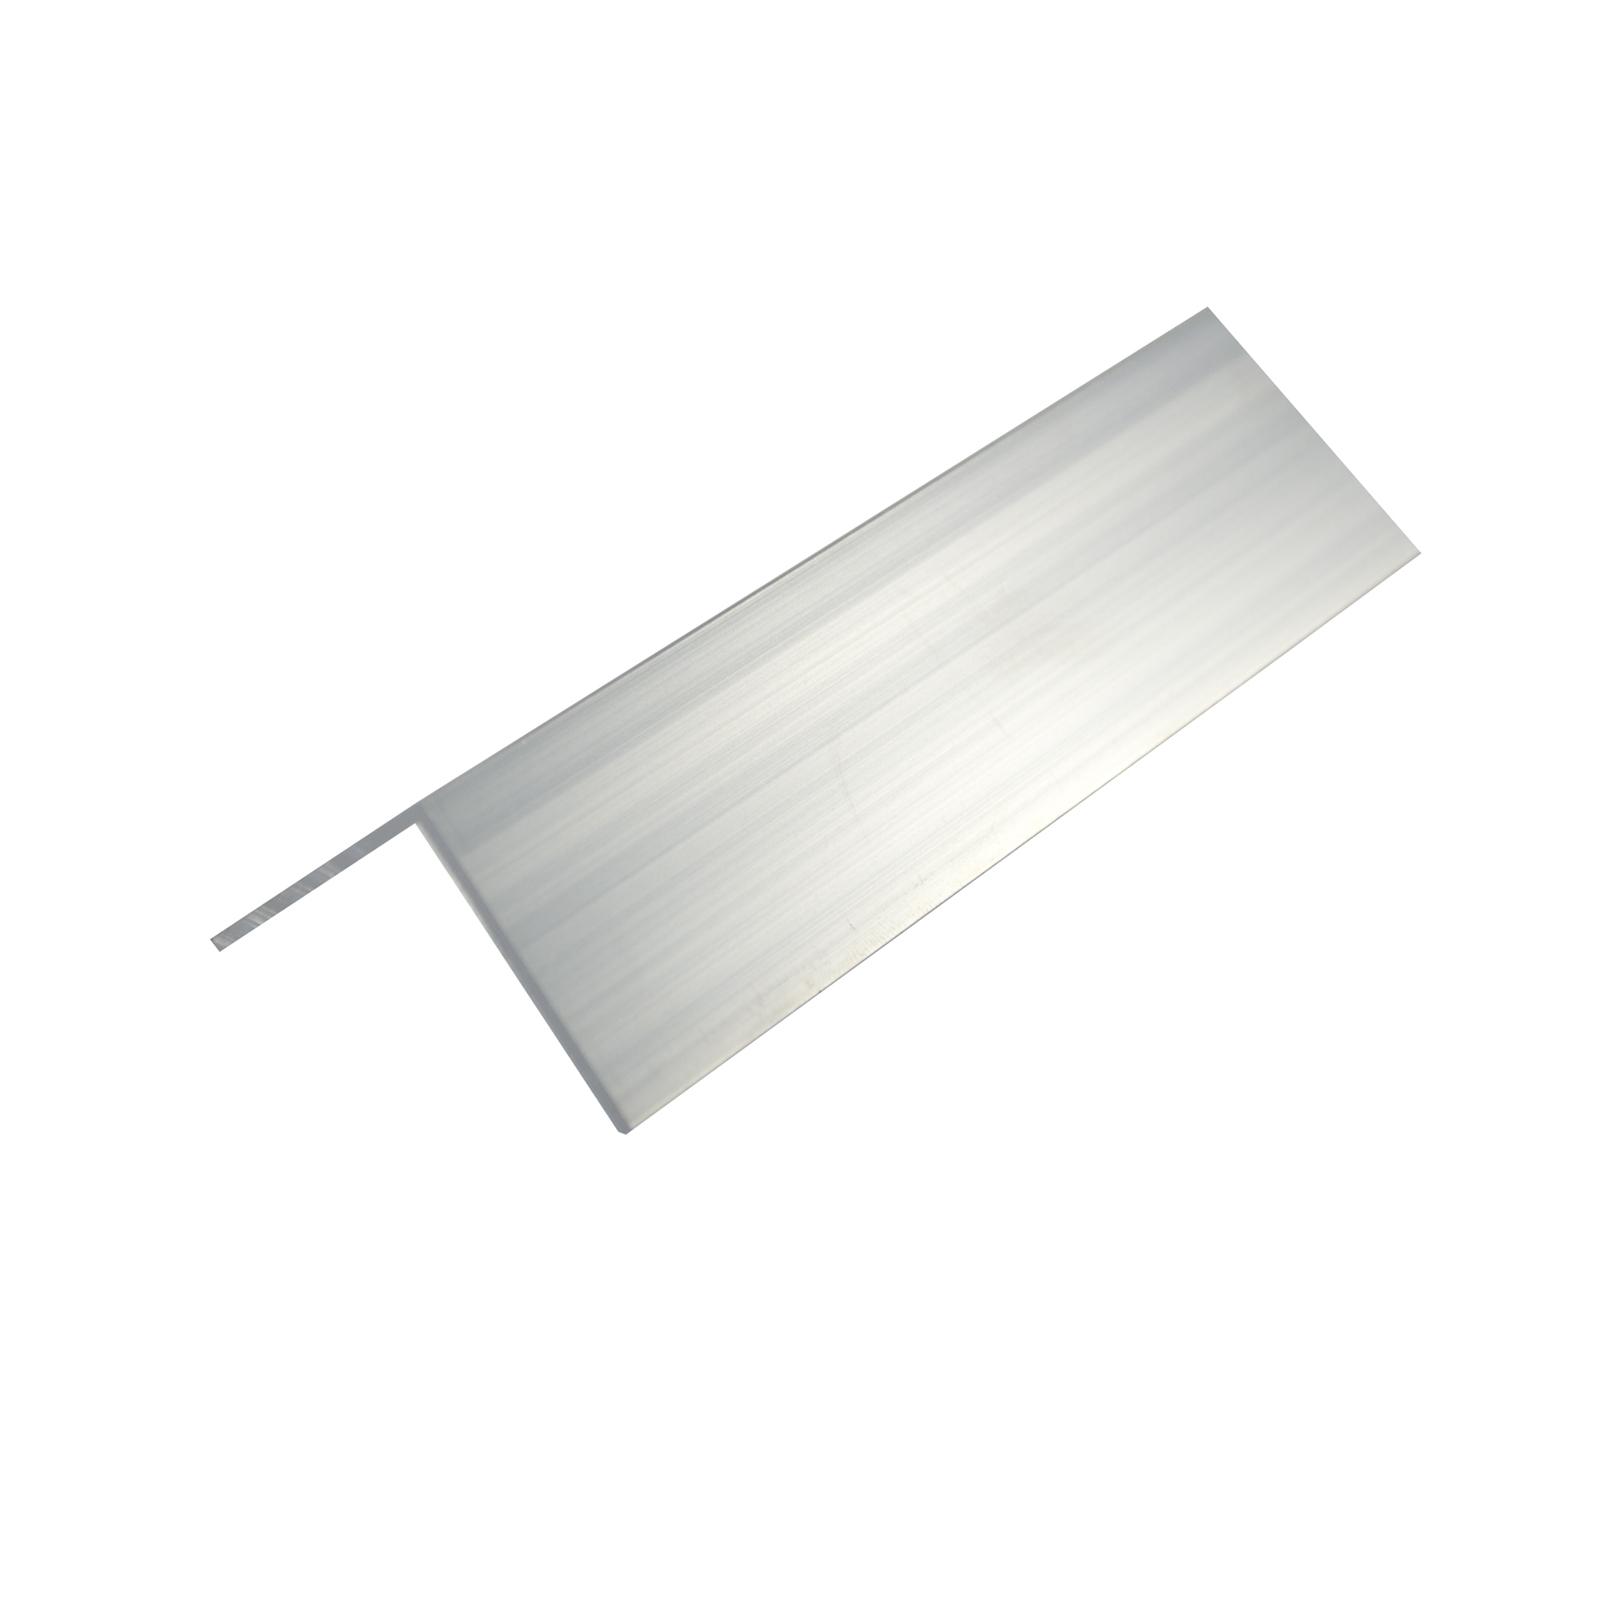 Metal Mate 25 x 25 x 1.4mm 3m Aluminium Equal Angle